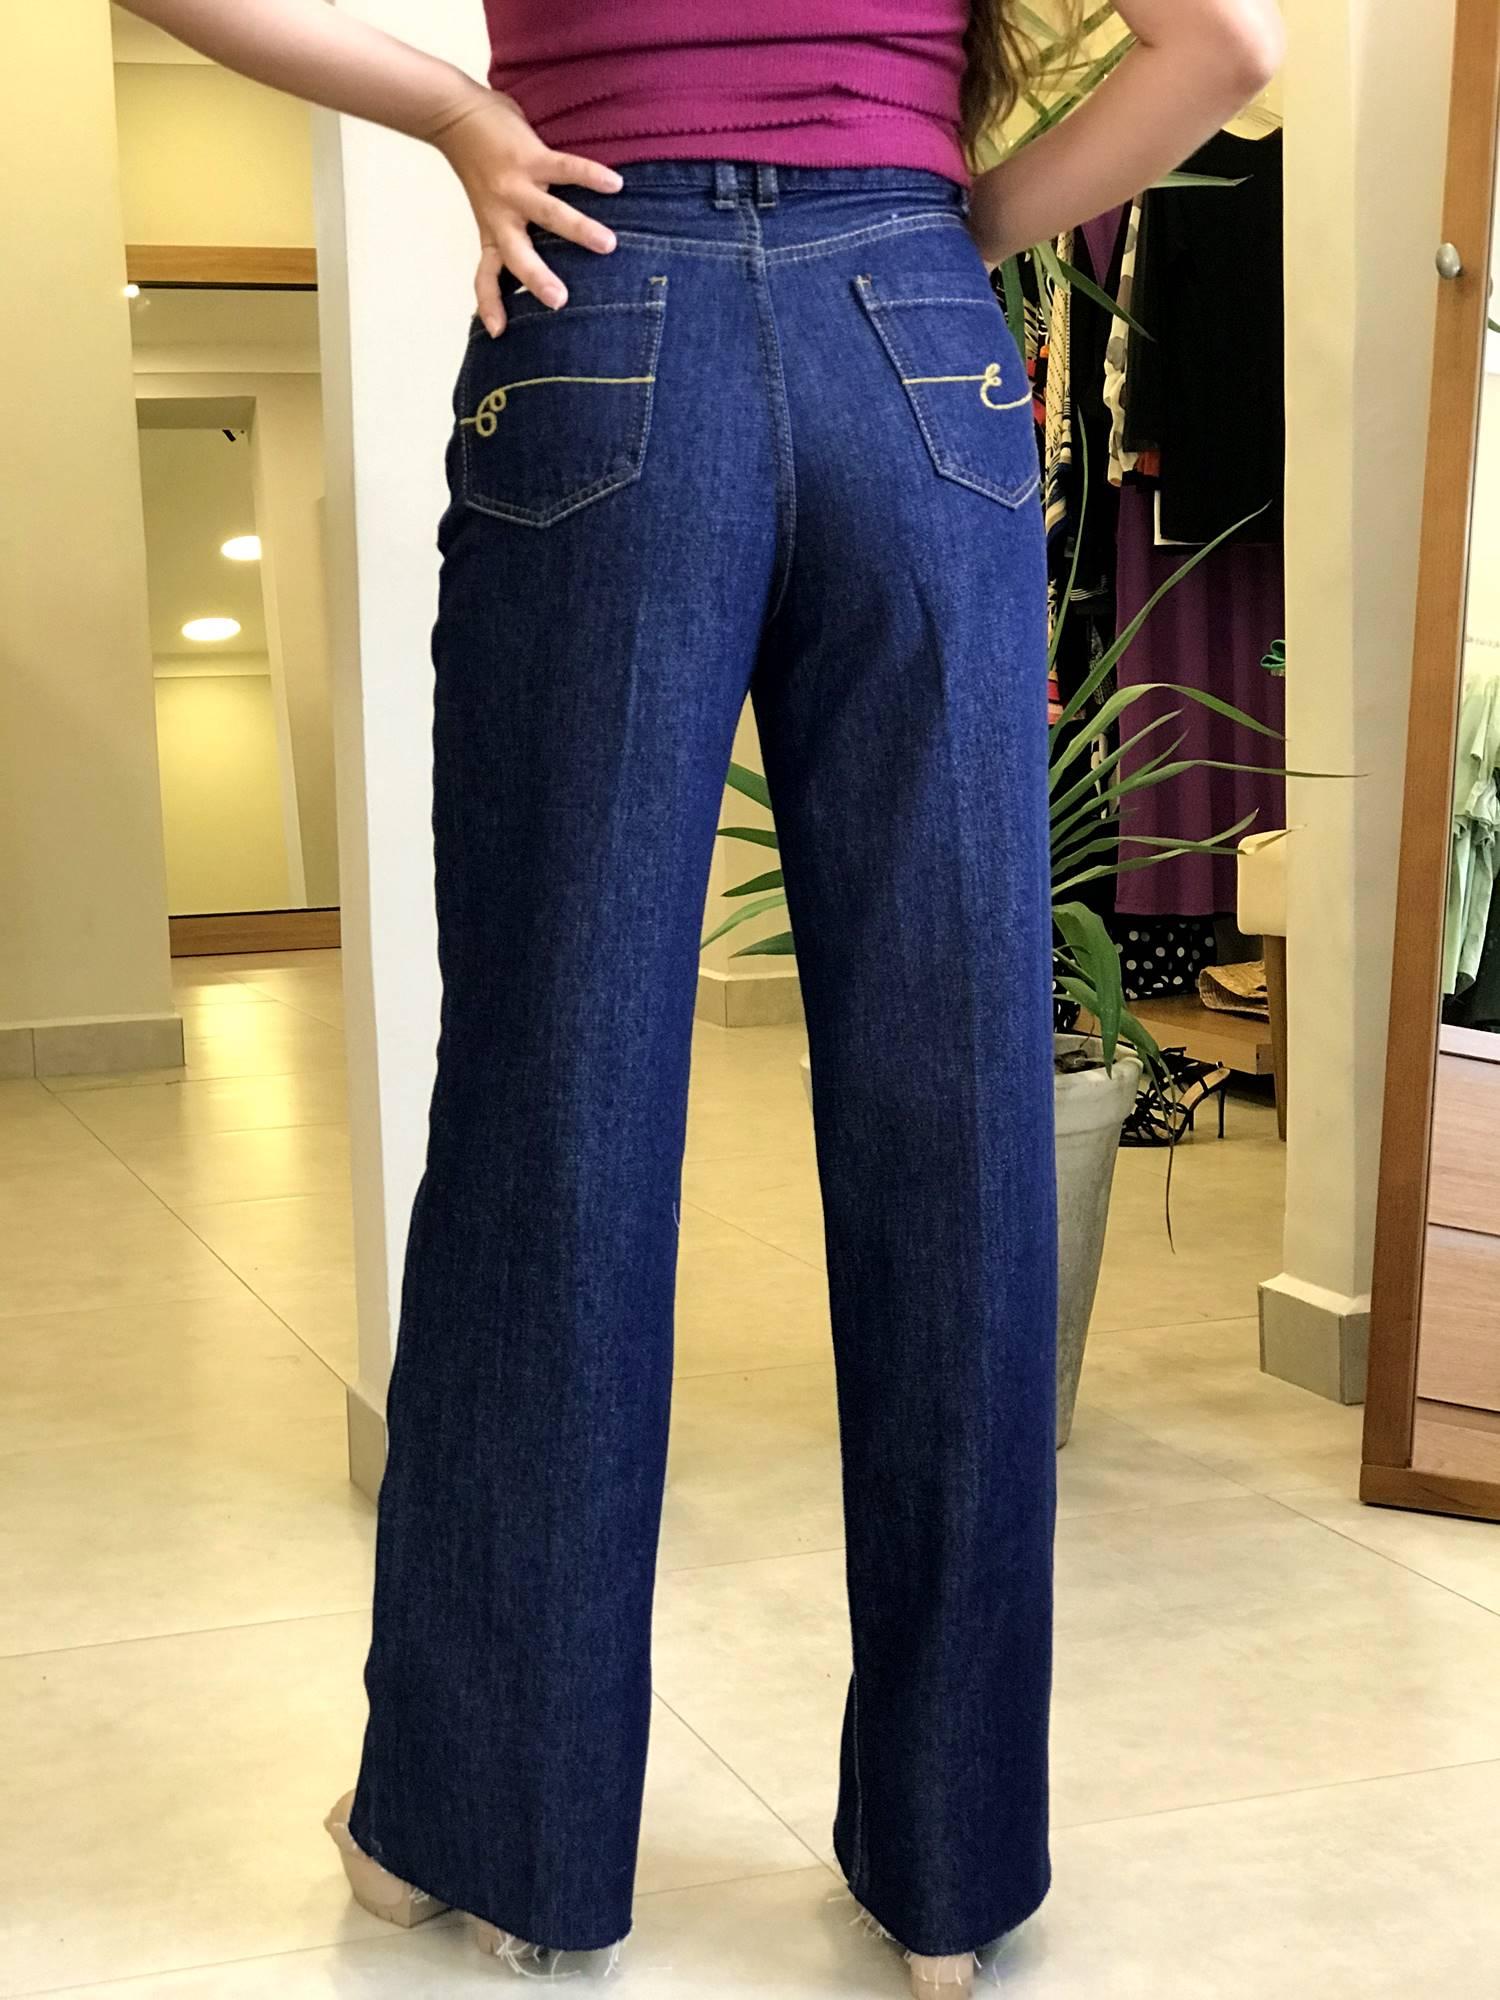 Calça Jeans Wide Leg Amaciada